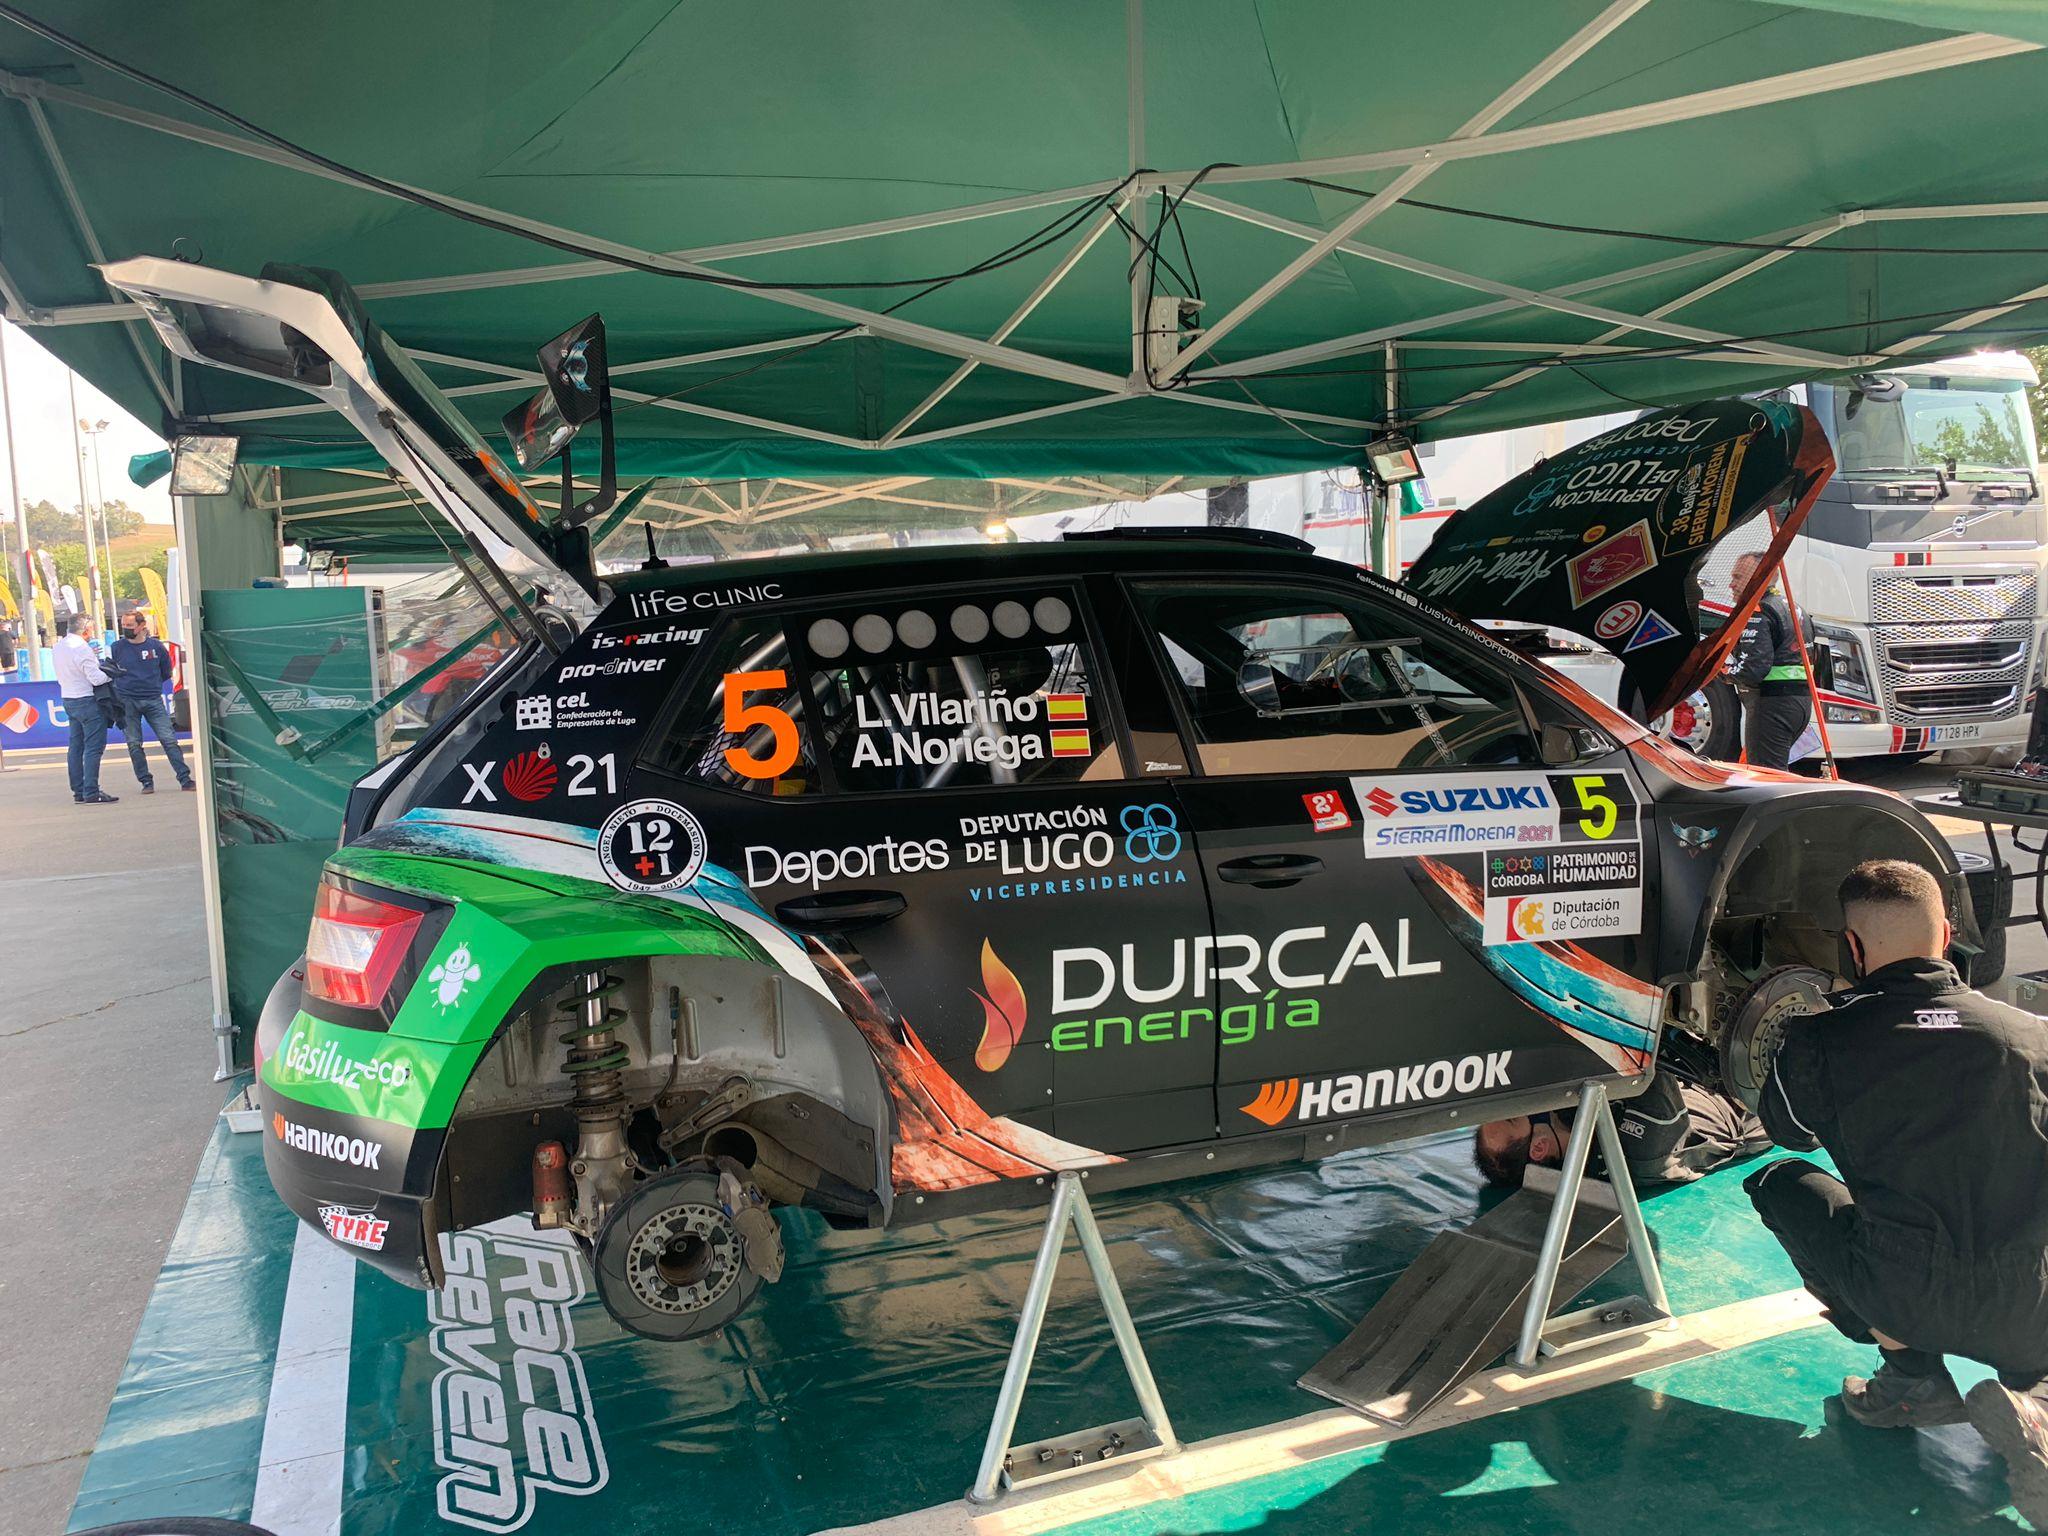 SCER + CERA + CERVH: 38º Rallye Sierra Morena - Internacional [8-10 Abril] - Página 3 Eyiz5UmWgAIV4QC?format=jpg&name=large